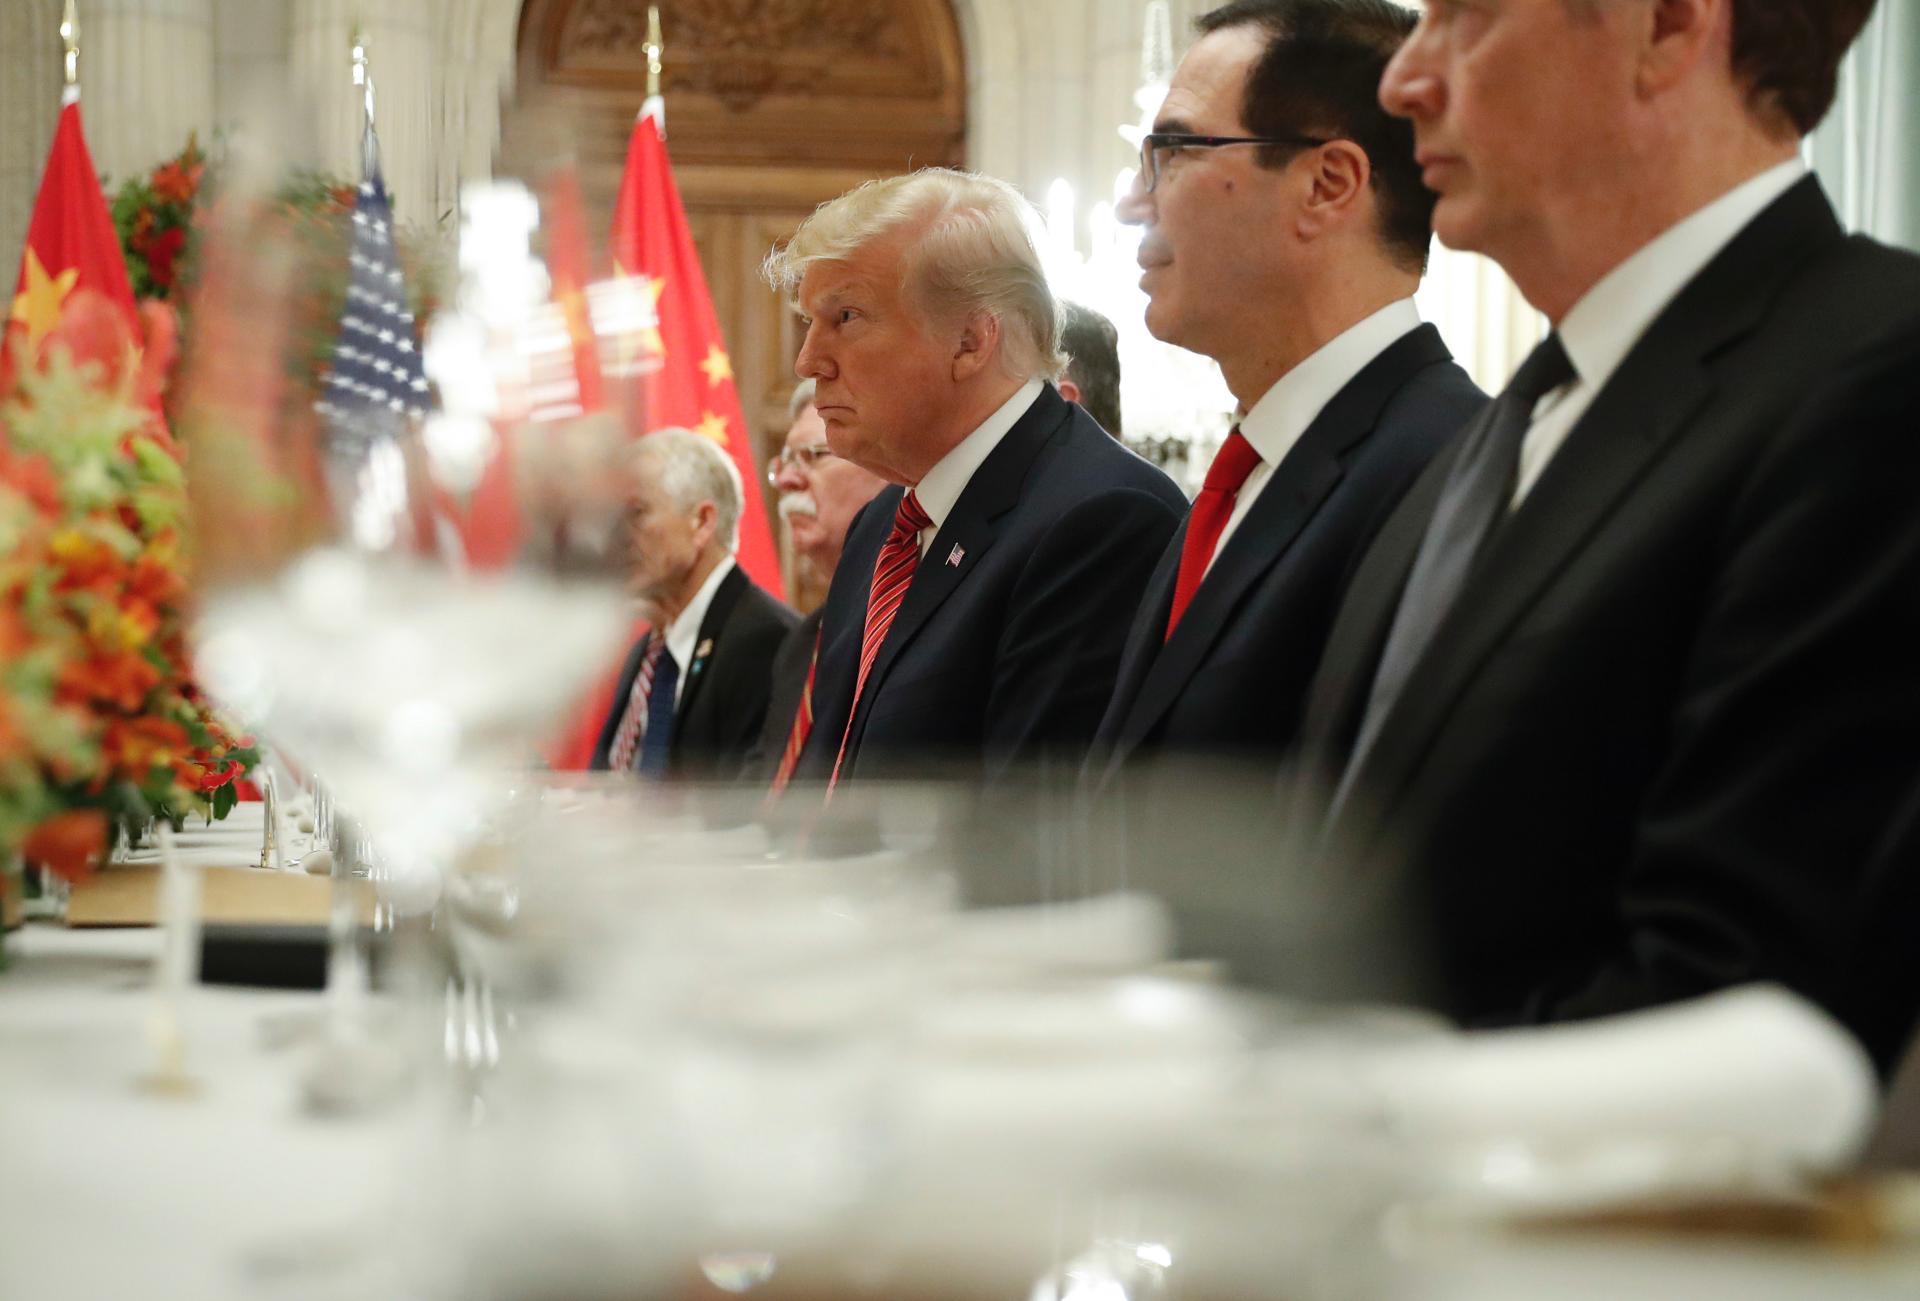 Trump threatens to raise tariffs on $200B worth of Chinese goods to 25 percent | Fox News